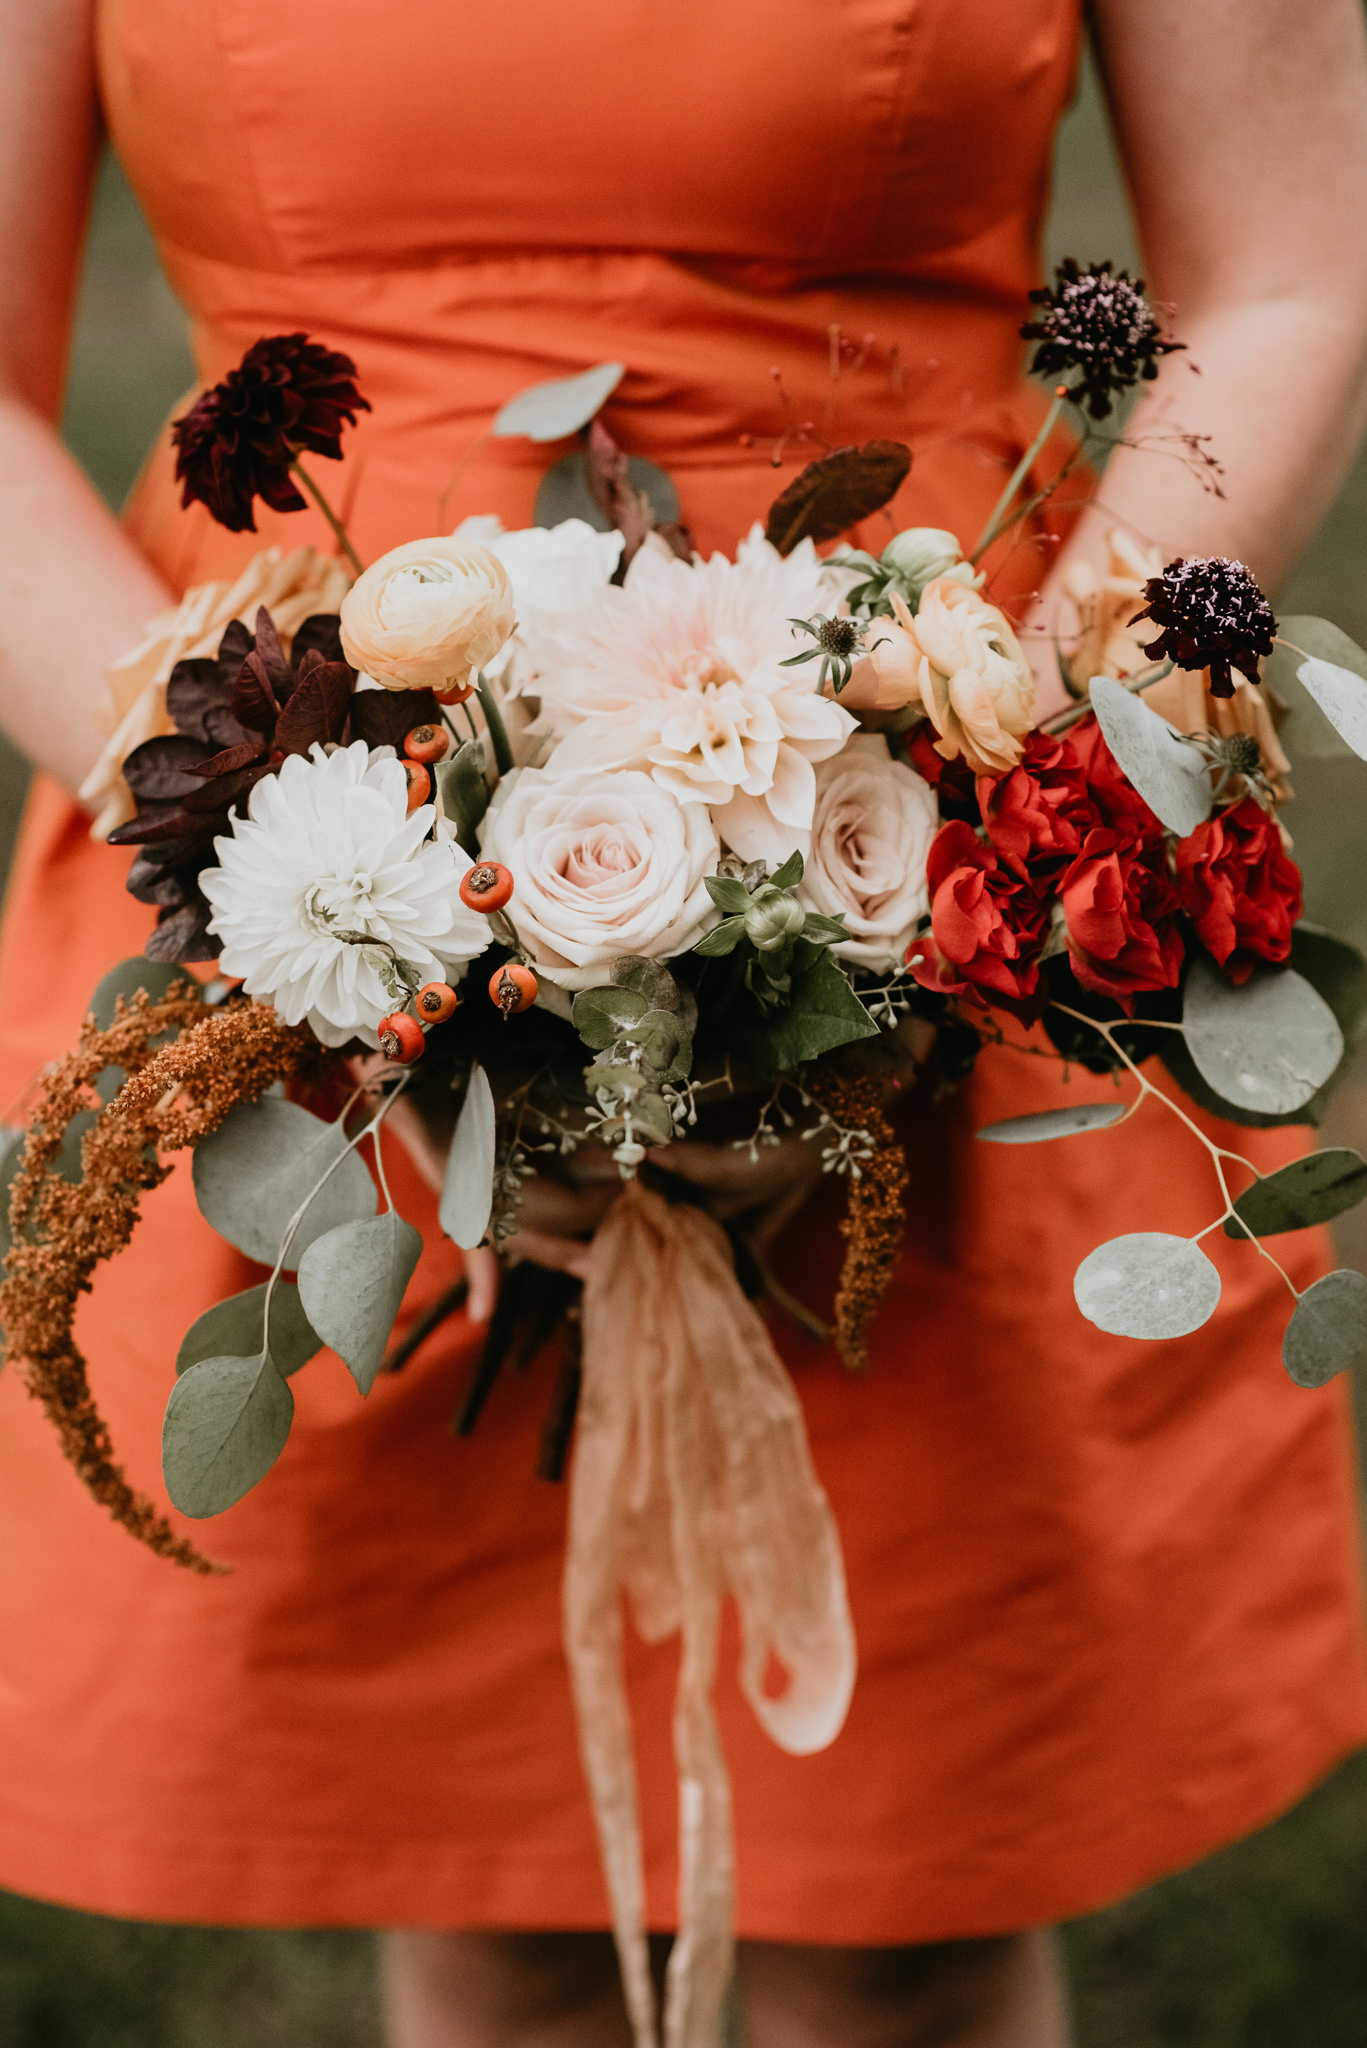 Sundara - Weddings - Virginia - Best Wedding Photographer - Pat Cori Photography-59.jpg